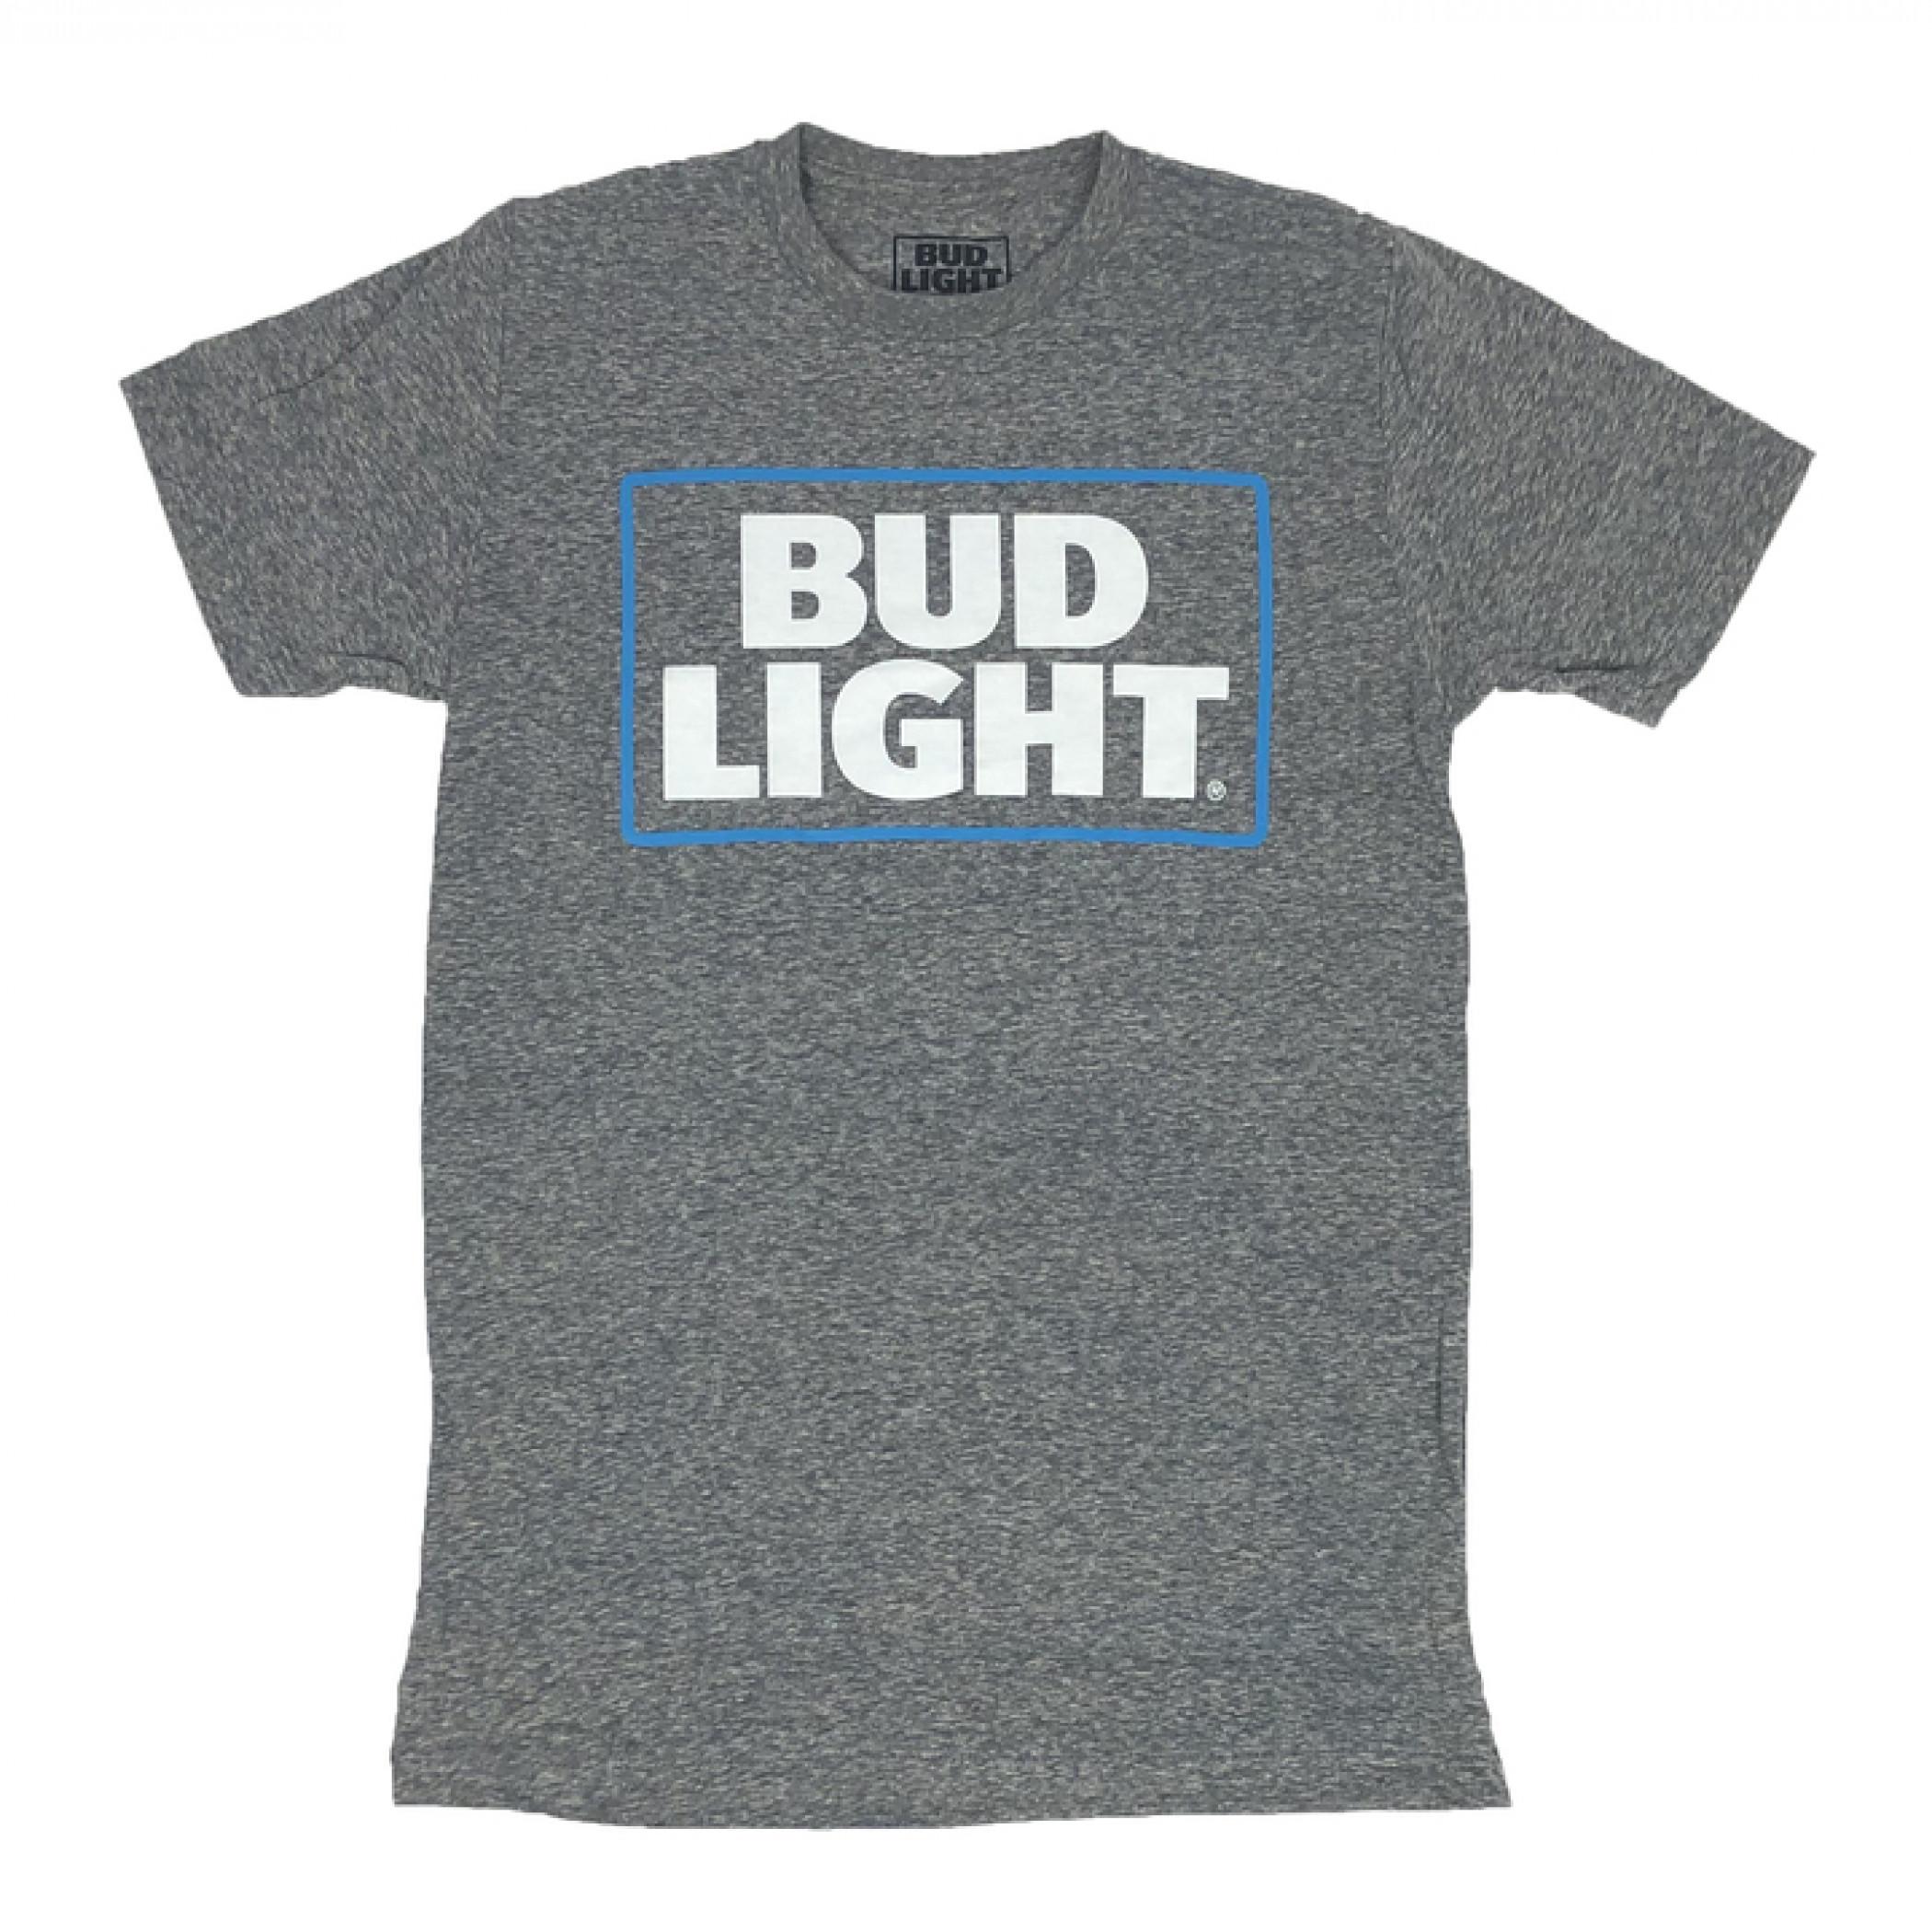 Bud Light Heather Grey Box Logo T-Shirt